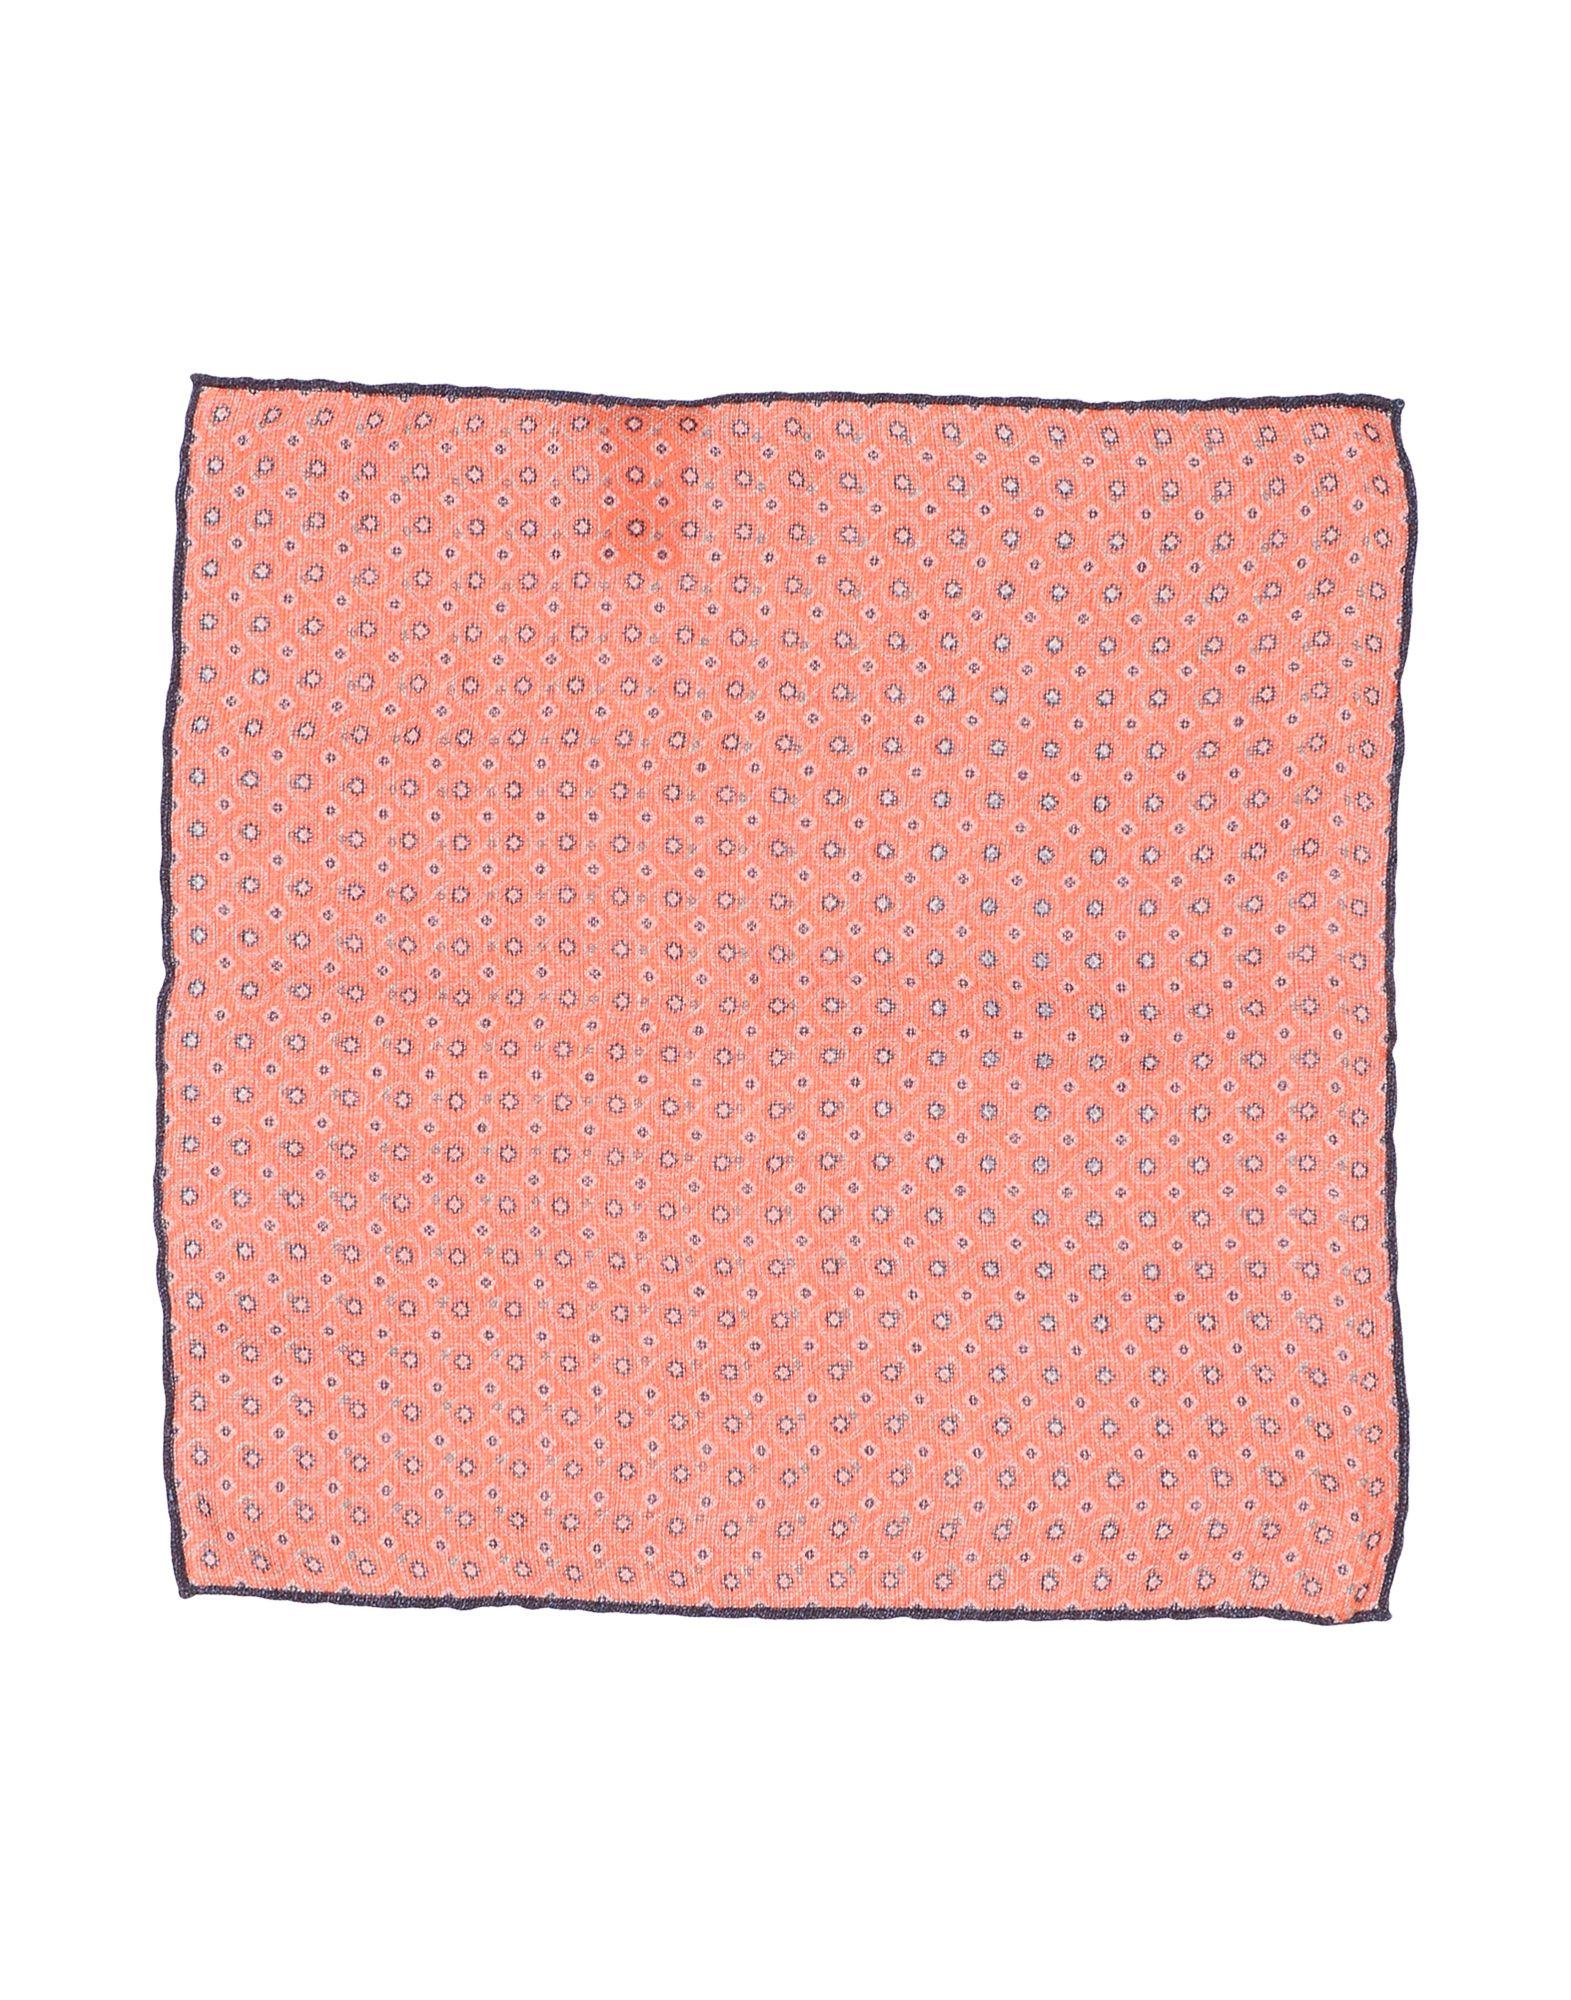 BRUNELLO CUCINELLI Платок жен комплект арт 16 0262 розово серый р 50